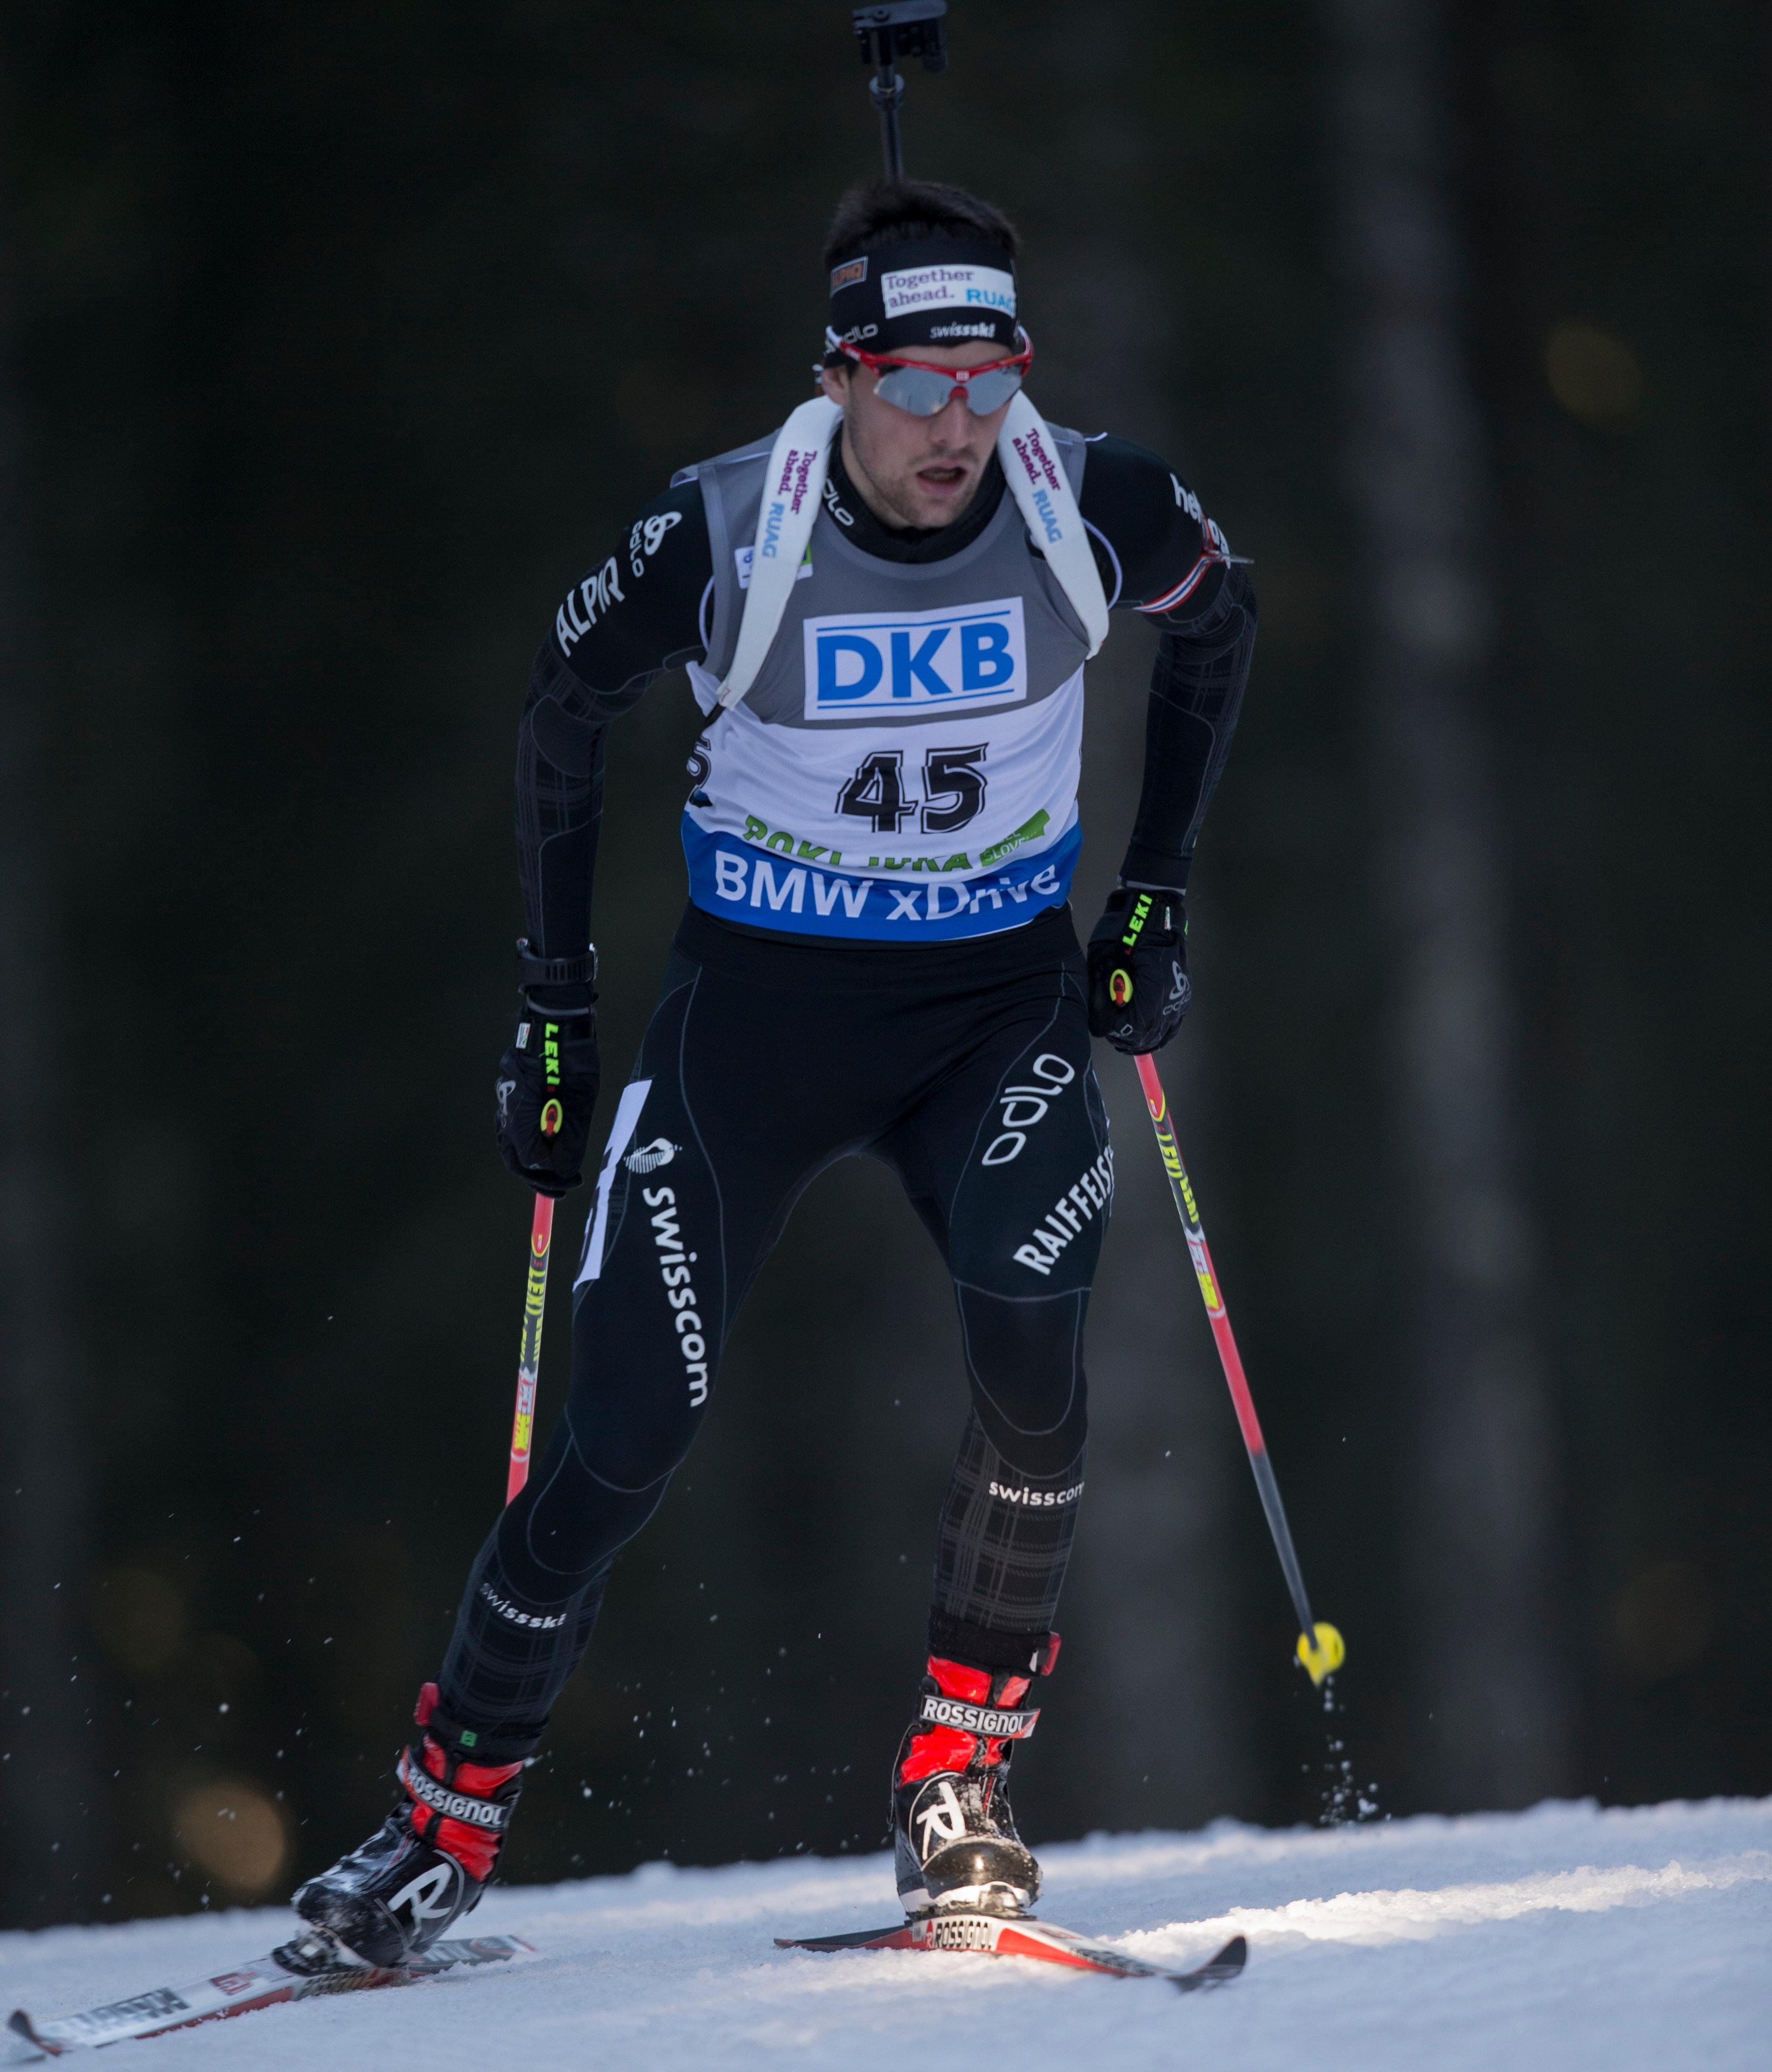 IBU world cup biathlon, sprint men, Pokljuka (SLO)